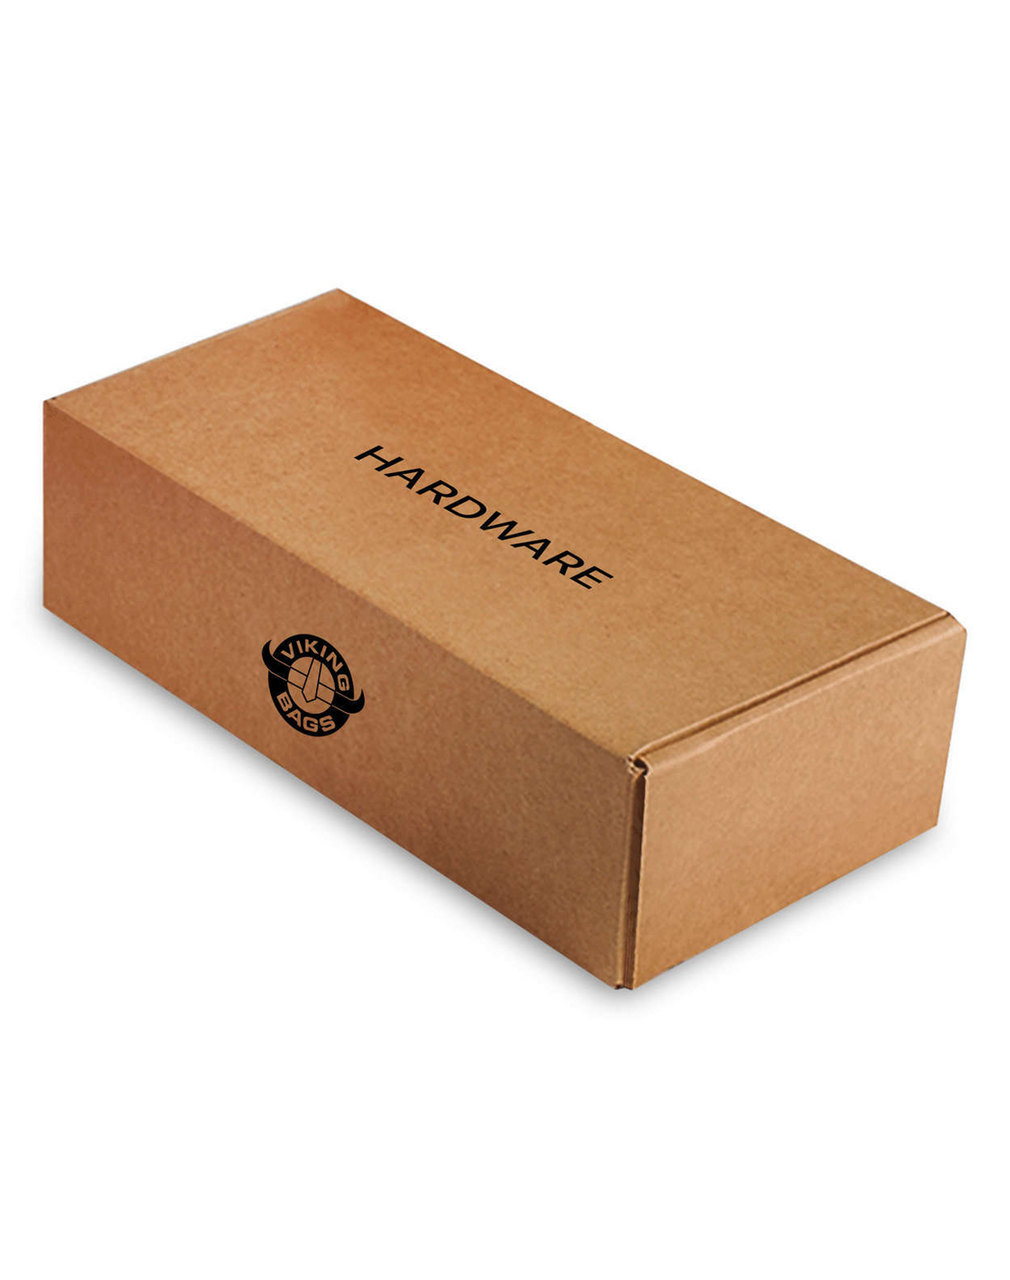 Triumph Thunderbird Lamellar Extra Large Shock Cutout Leather Covered Saddlebag Box